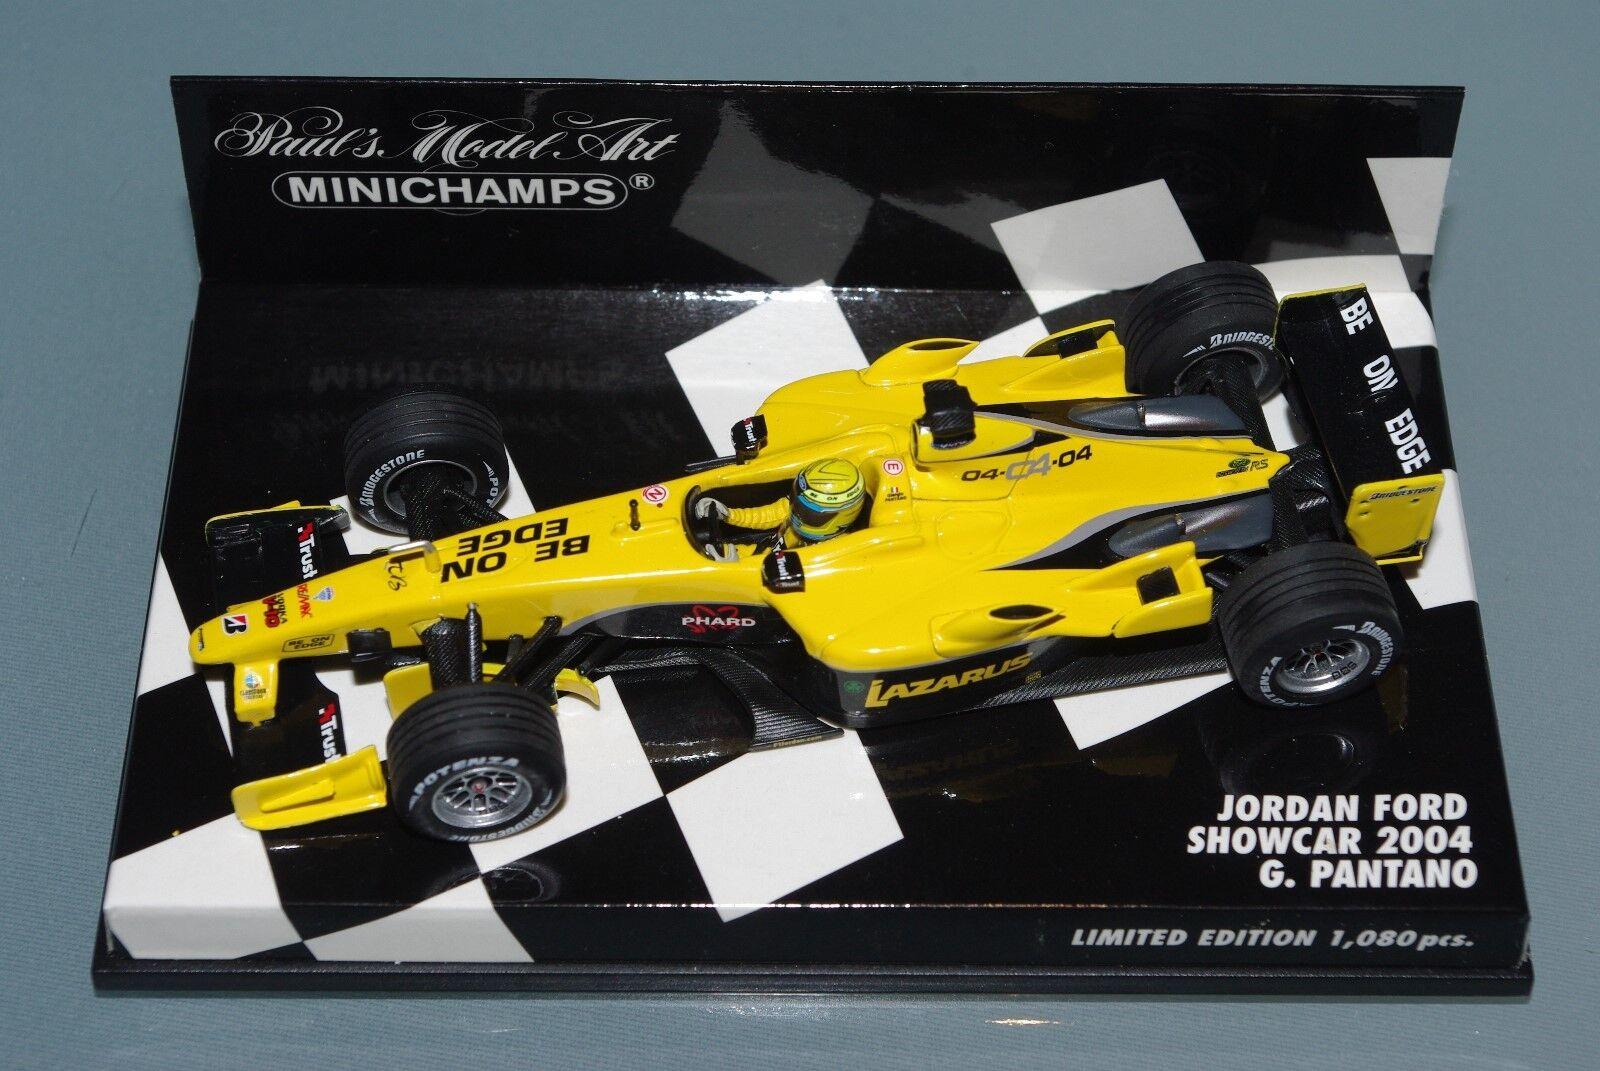 Minichamps F1 1 43 Jordan Ford Car 2004-G. Pantano-Limited Edition 1080p